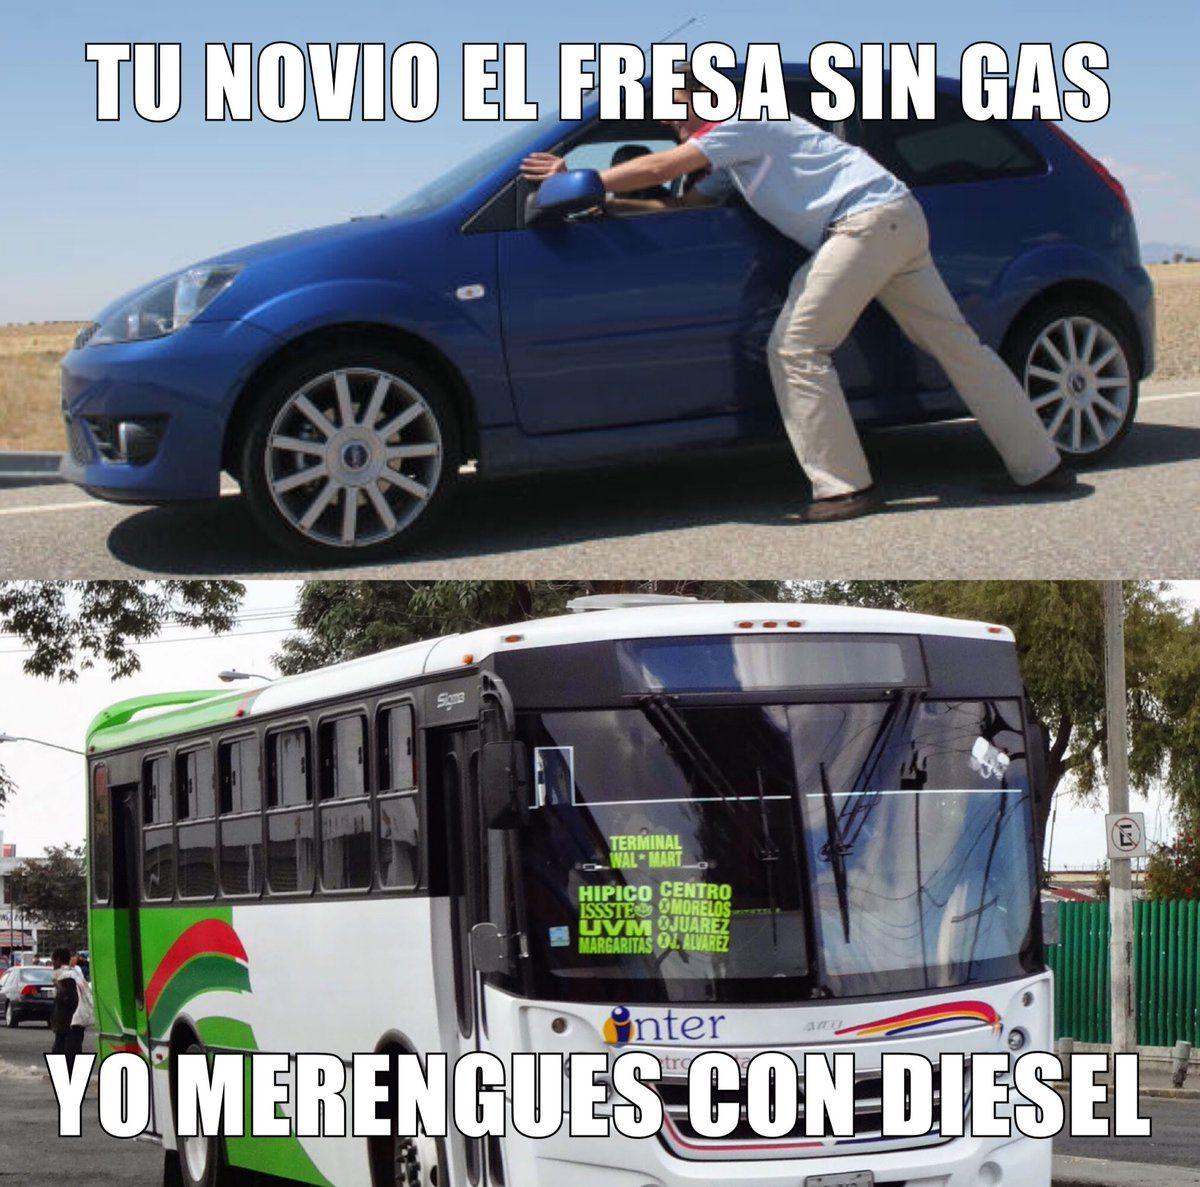 Tu novio el fresa sin gas, yo merengues #DesabastodeGasolina  #MéxicoSinGasolina #DameMasGasolina #Huachicoleros #Gasolina   Memes,  Chiste meme y Gasolina